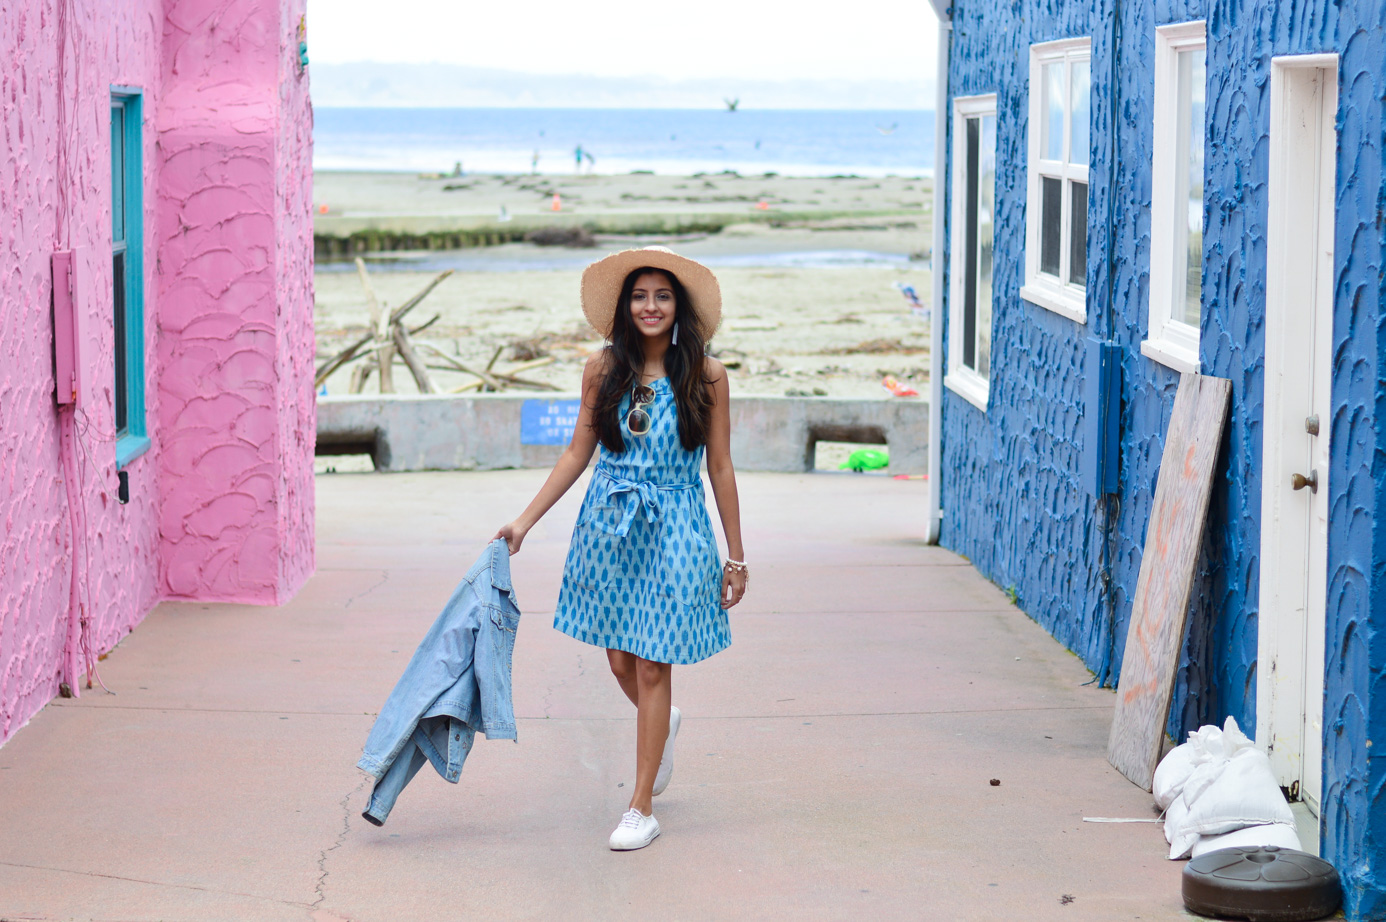 ikat-dress-blue-summer-style-capitola-california-travel-blogger 1